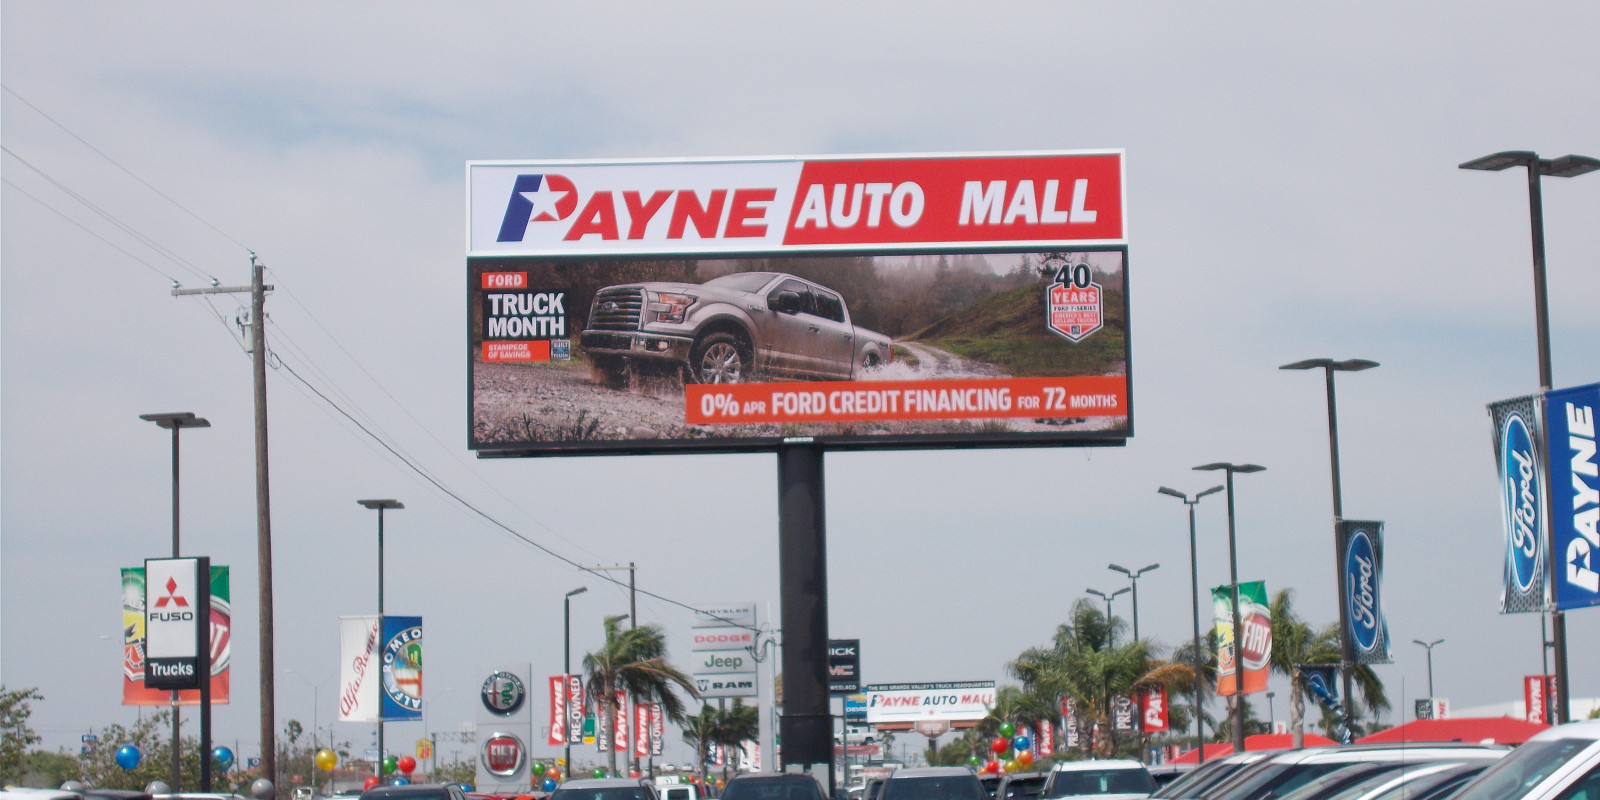 Payne Auto Mall 14' x 48 Digital Sign & 7' x 48' Double Sided illuminated ID Cabinets